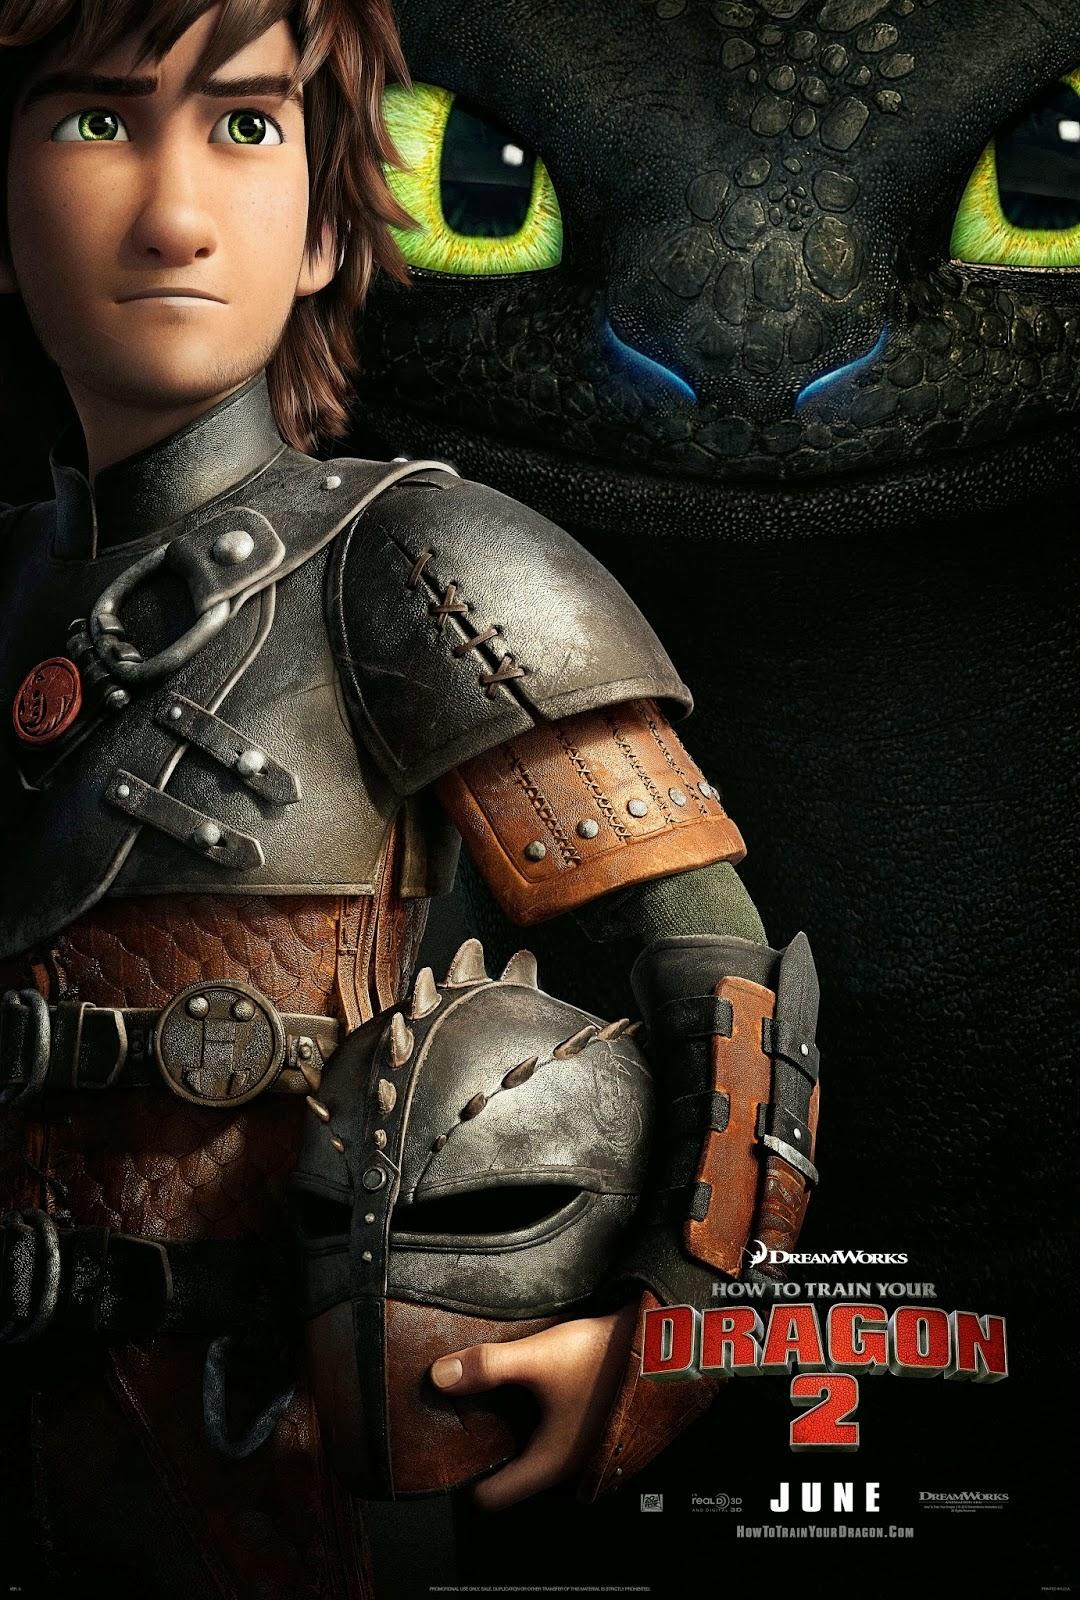 How to Train Your Dragon 2 อภินิหารไวกิ้งพิชิตมังกร 2 HD พากย์ไทย